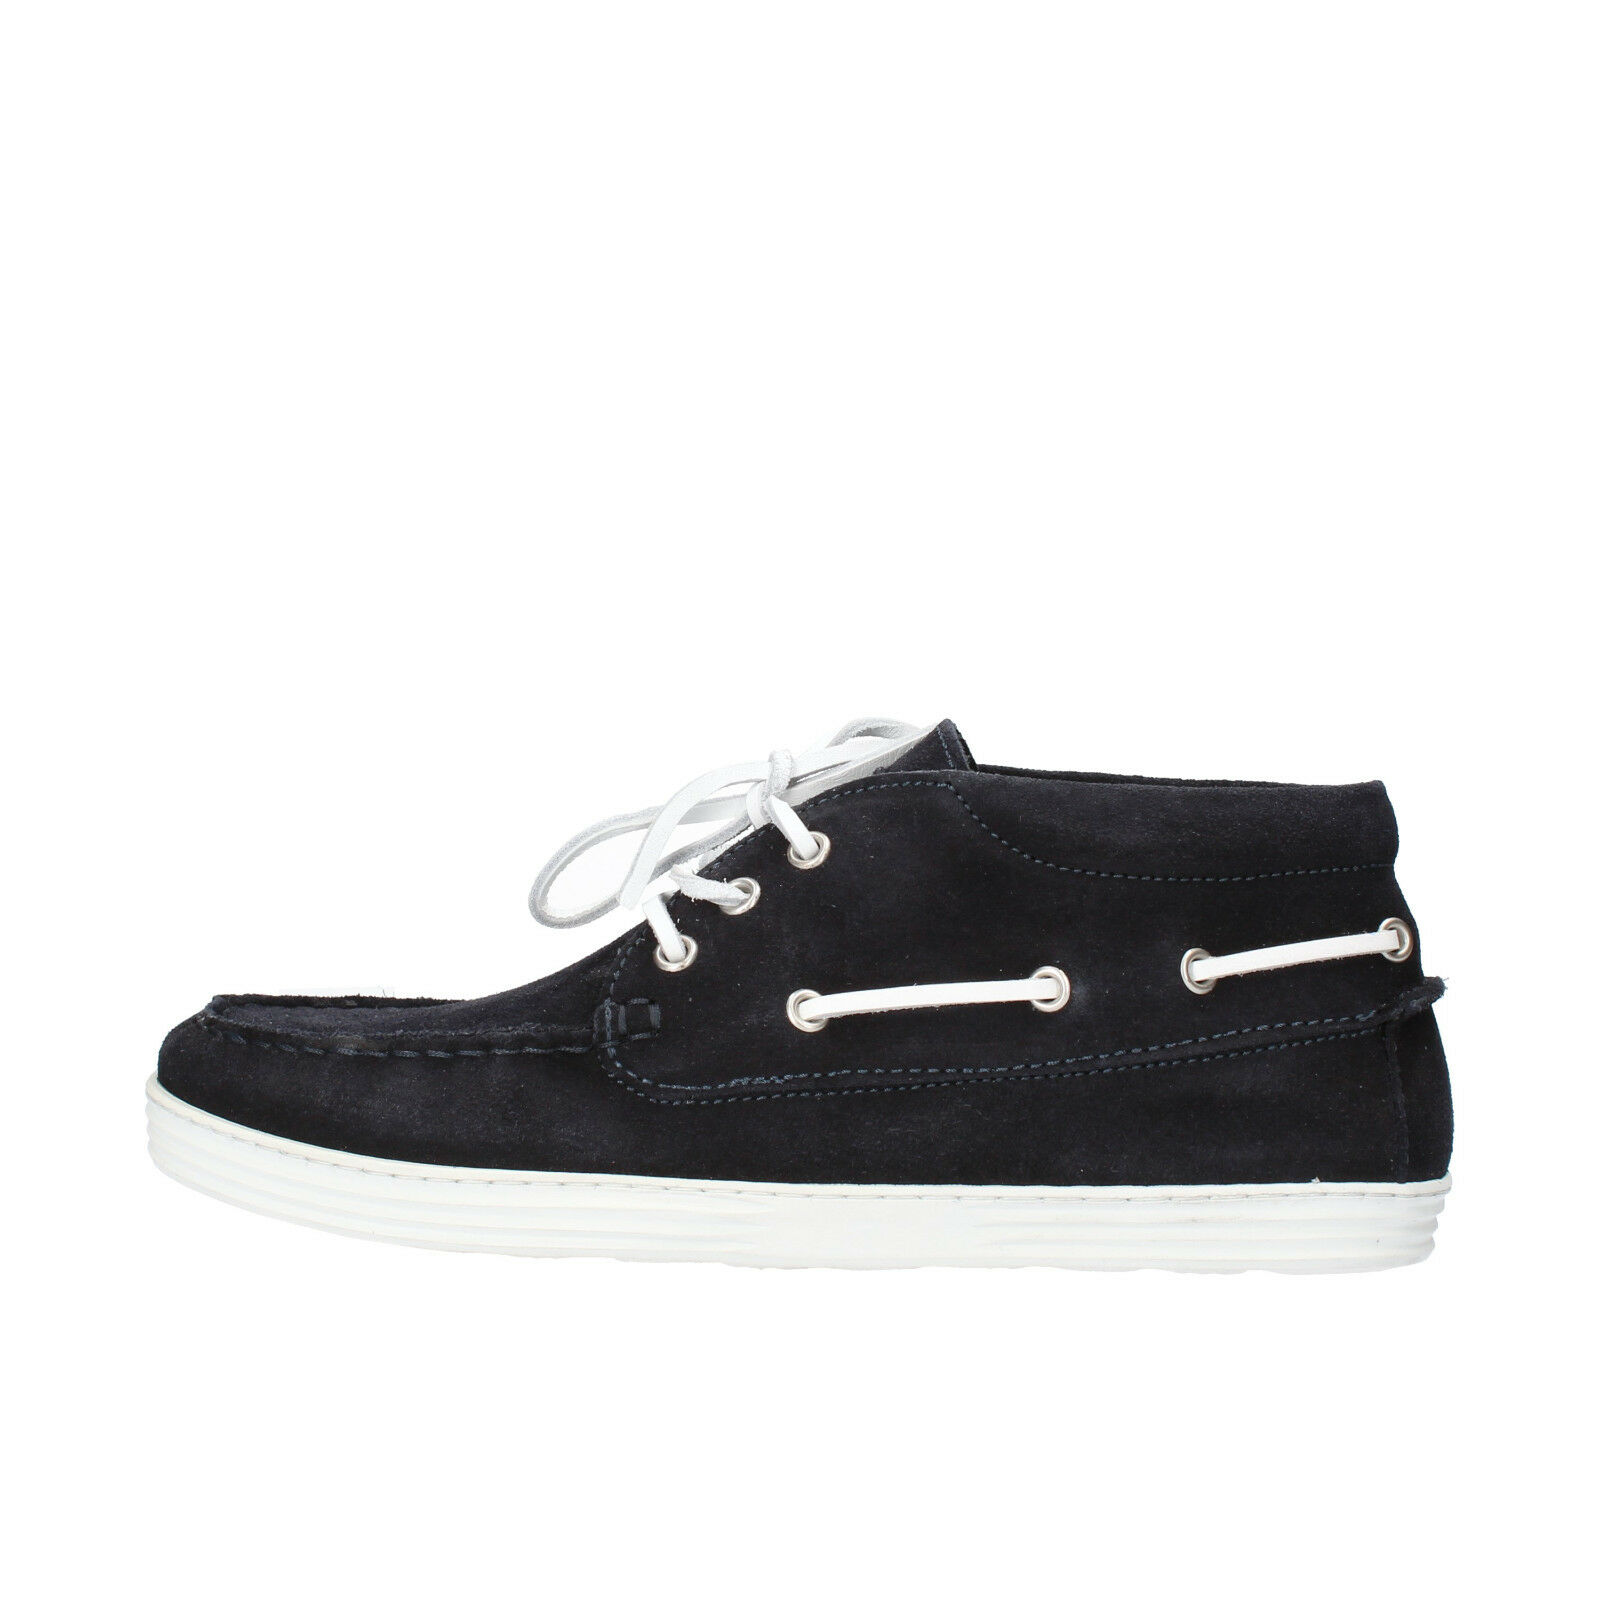 Mens shoes DOCKSTEPS 6 (EU 40) desert boots bluee suede AG845-B